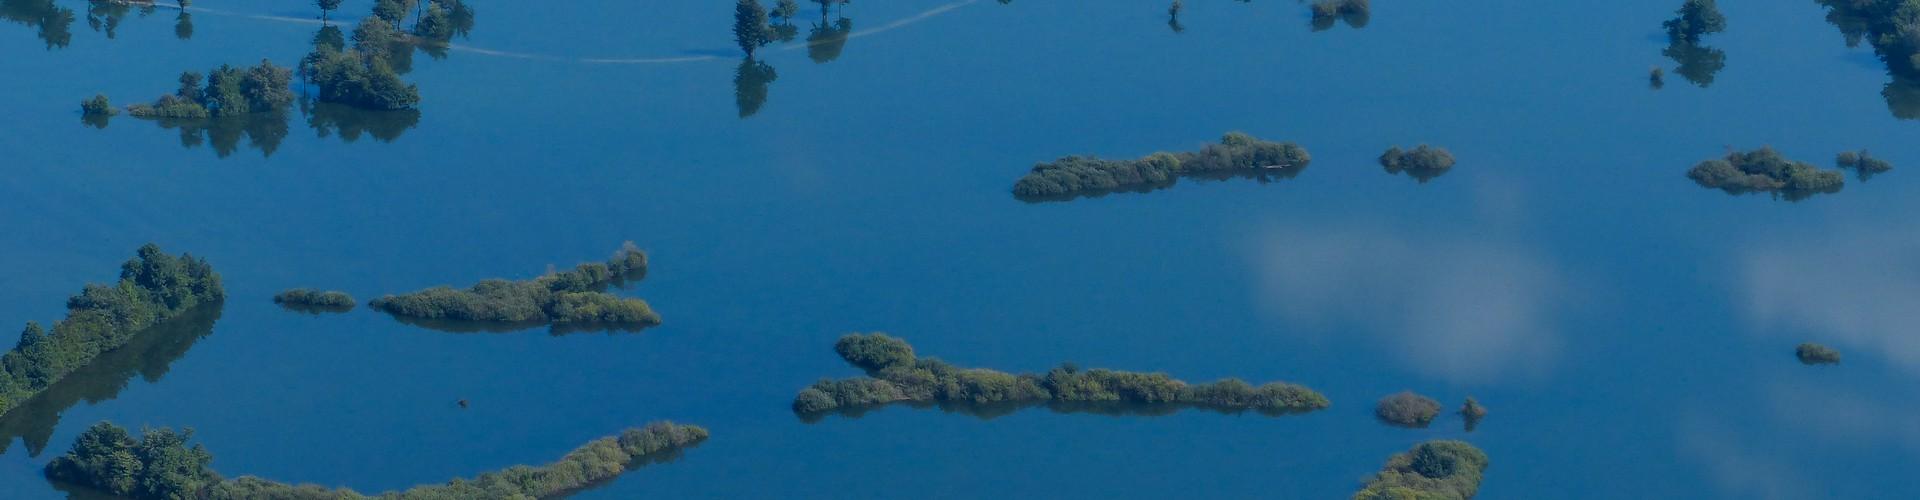 flooding immageo.jpg (Credit: Cyril Mayaud)